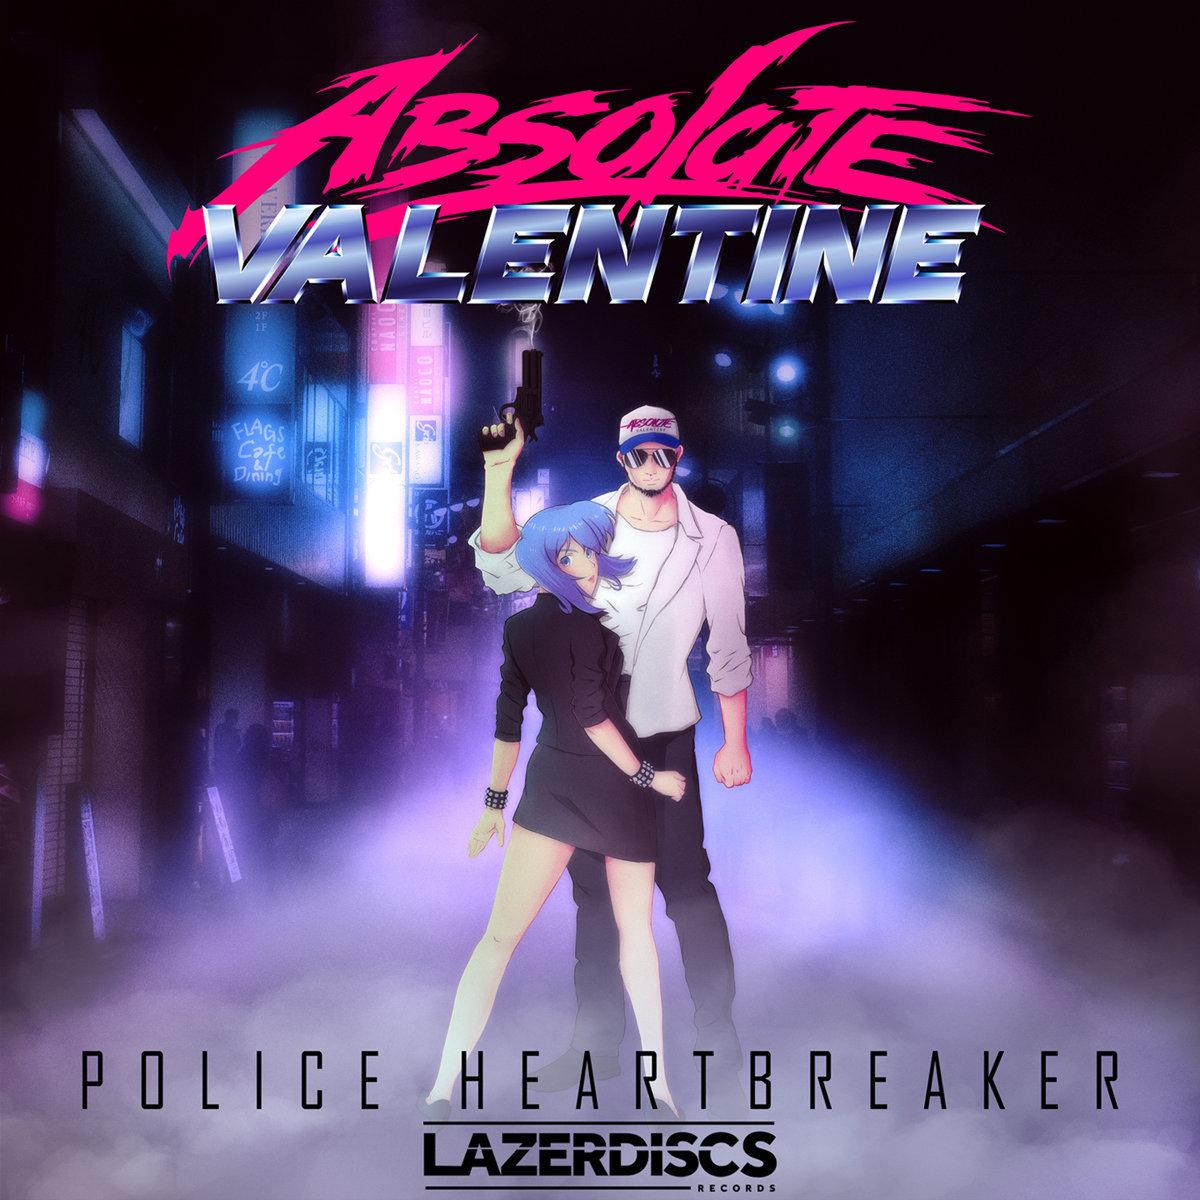 absolute valentine - police heartbreaker